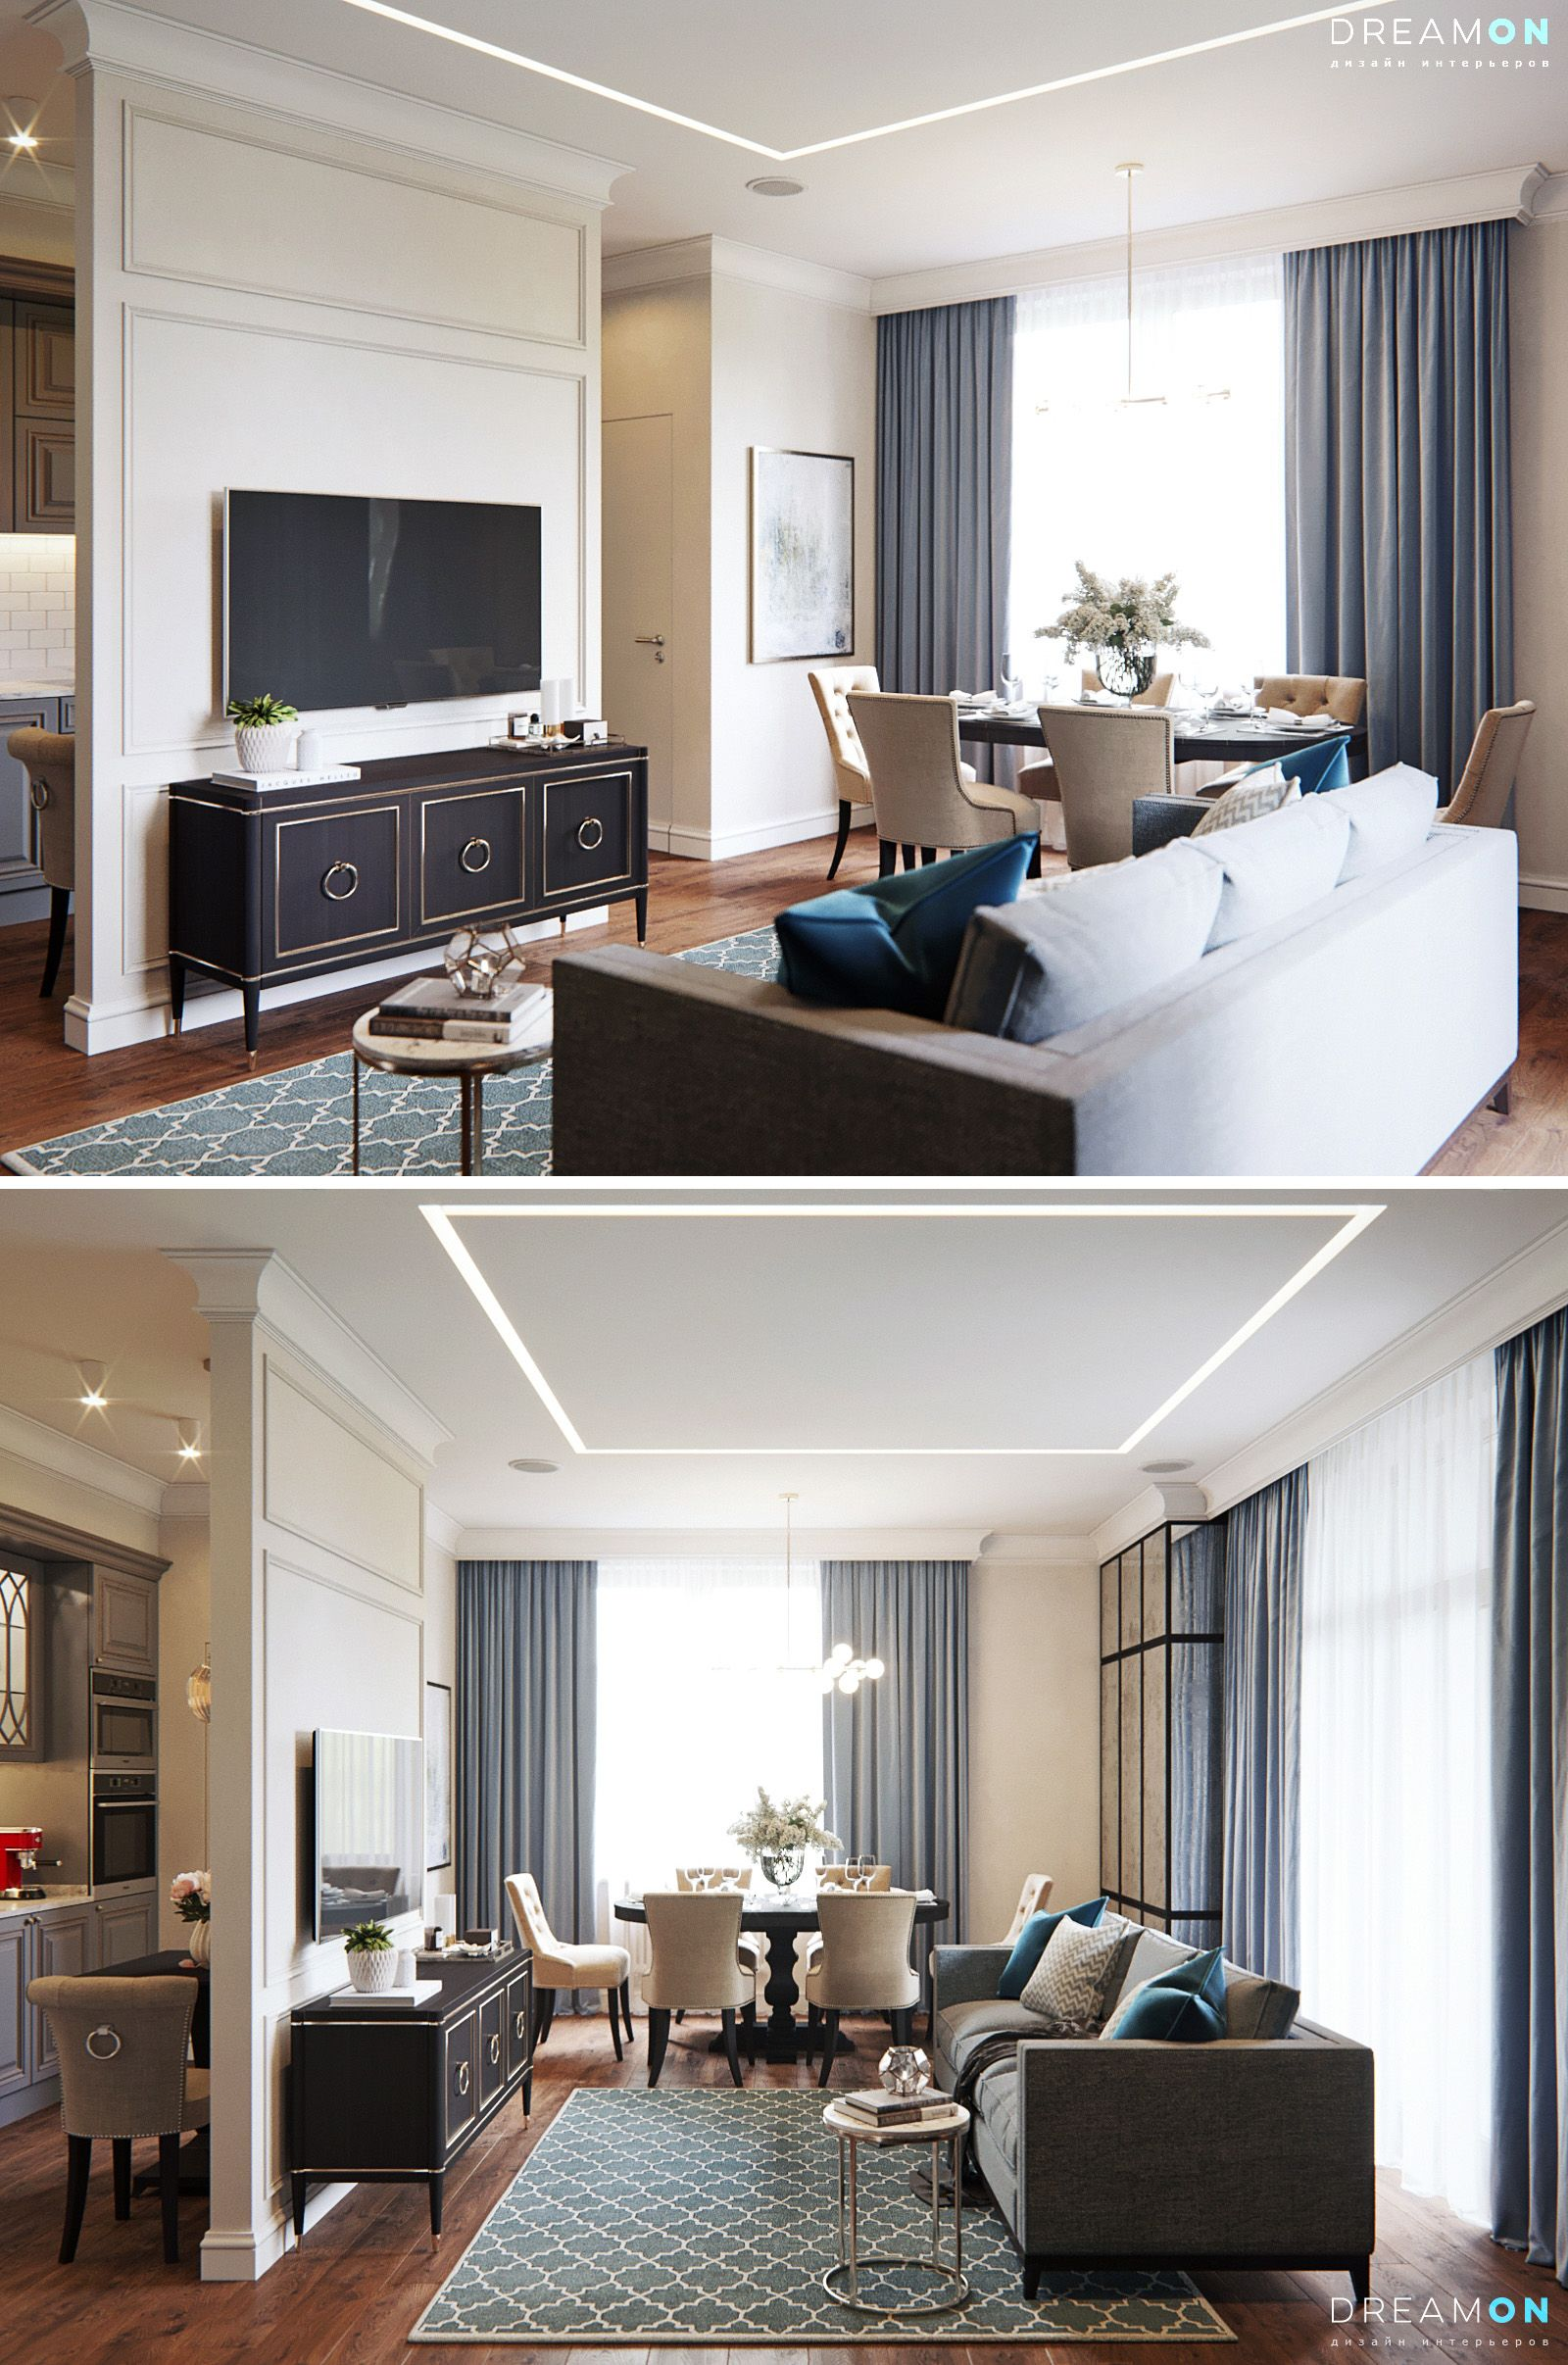 Livingroom + Kitchen - Галерея 3ddd.ru | Living room | Pinterest ...